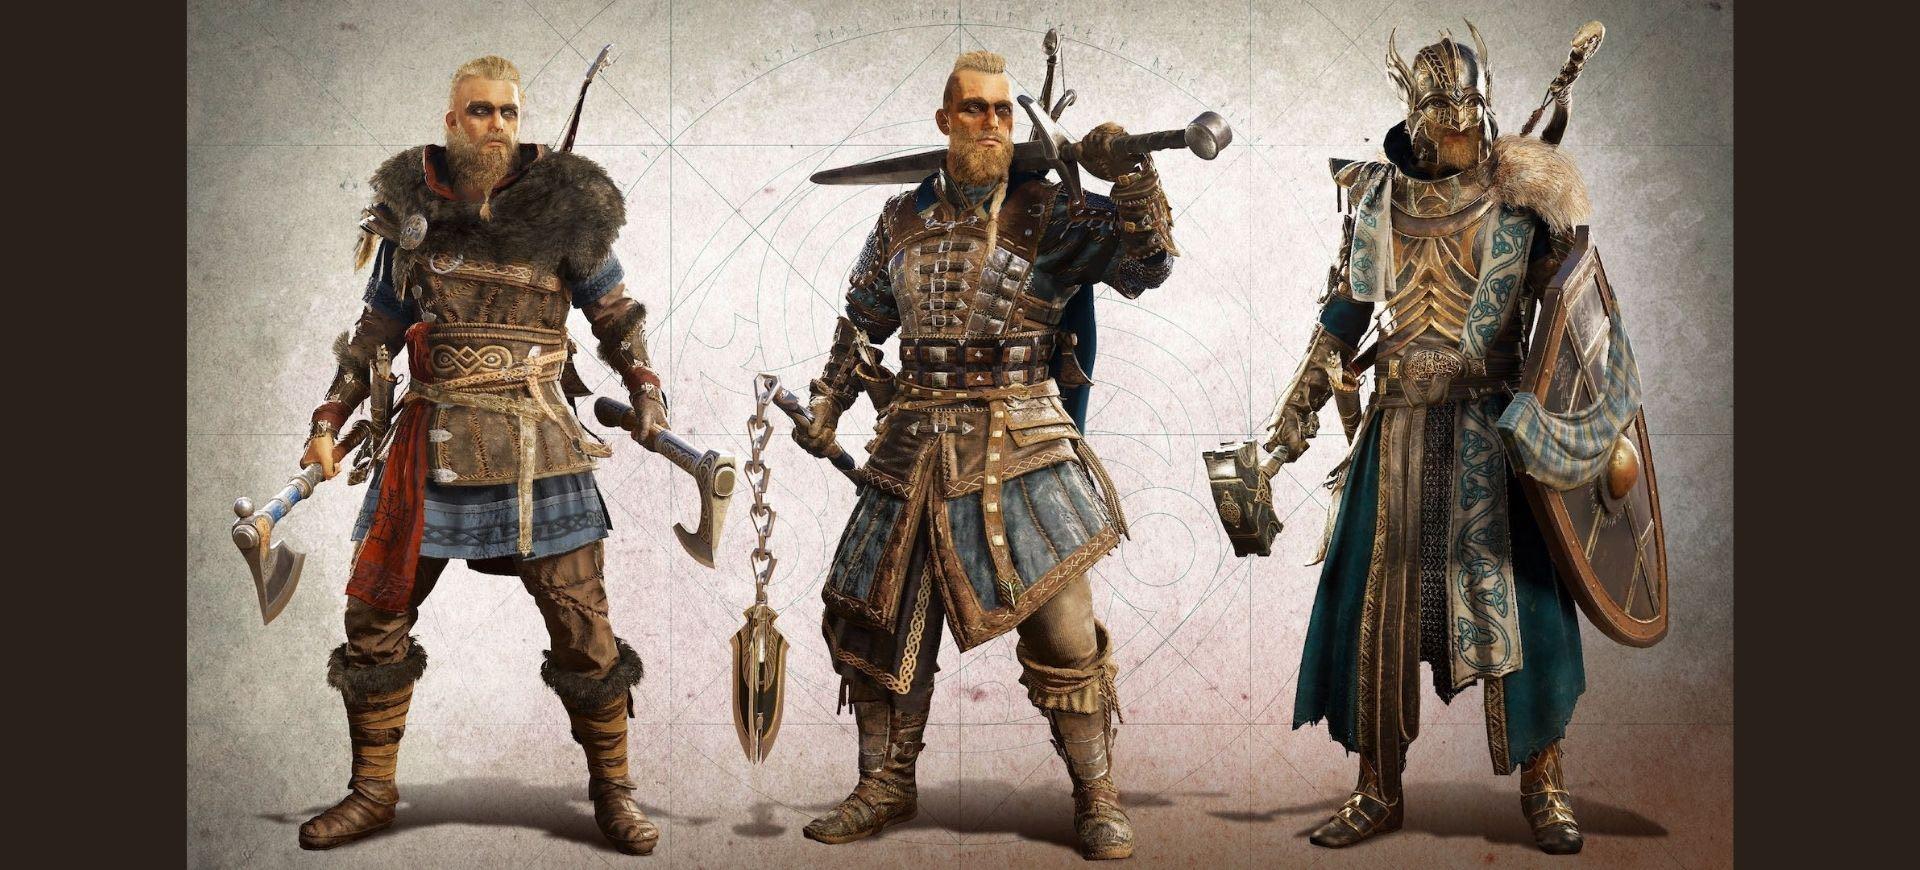 Hướng dẫn Assassin's Creed